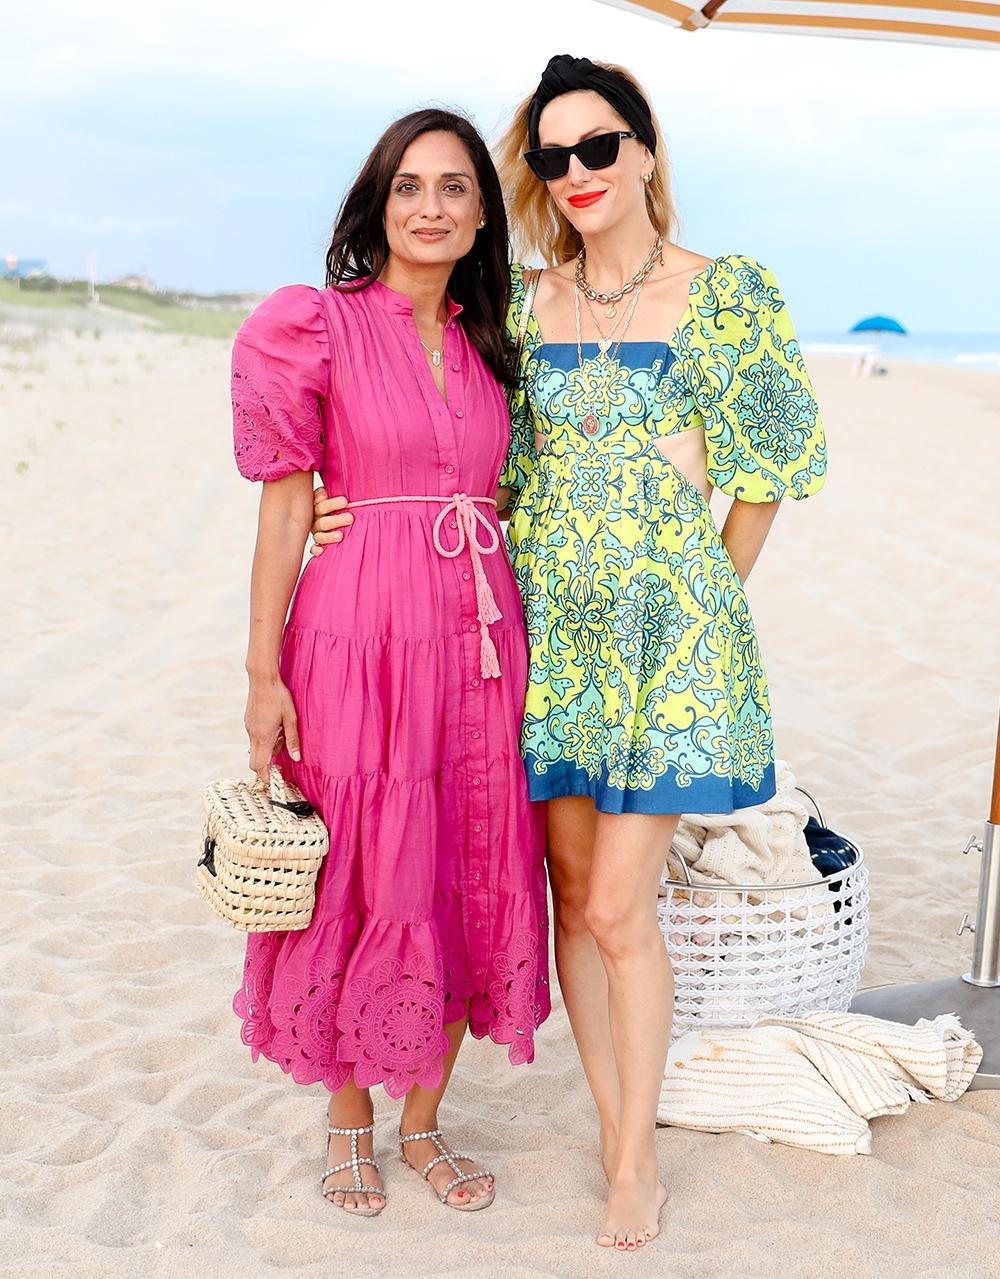 Roopal Petal and Joanna Hilman at our Hamptons Summer Dinner